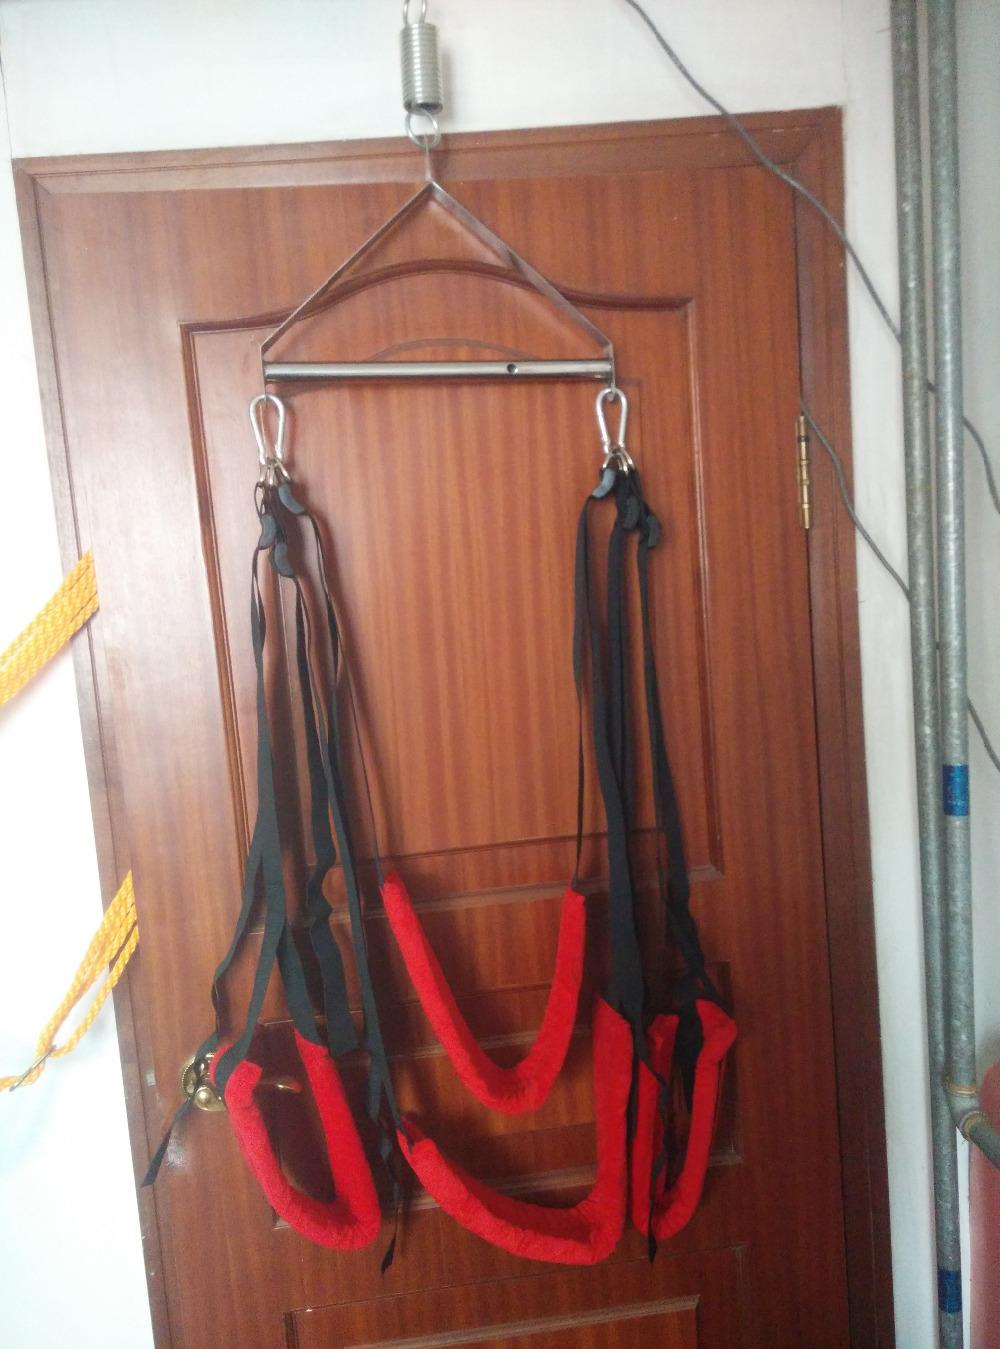 Adult frame sex swing